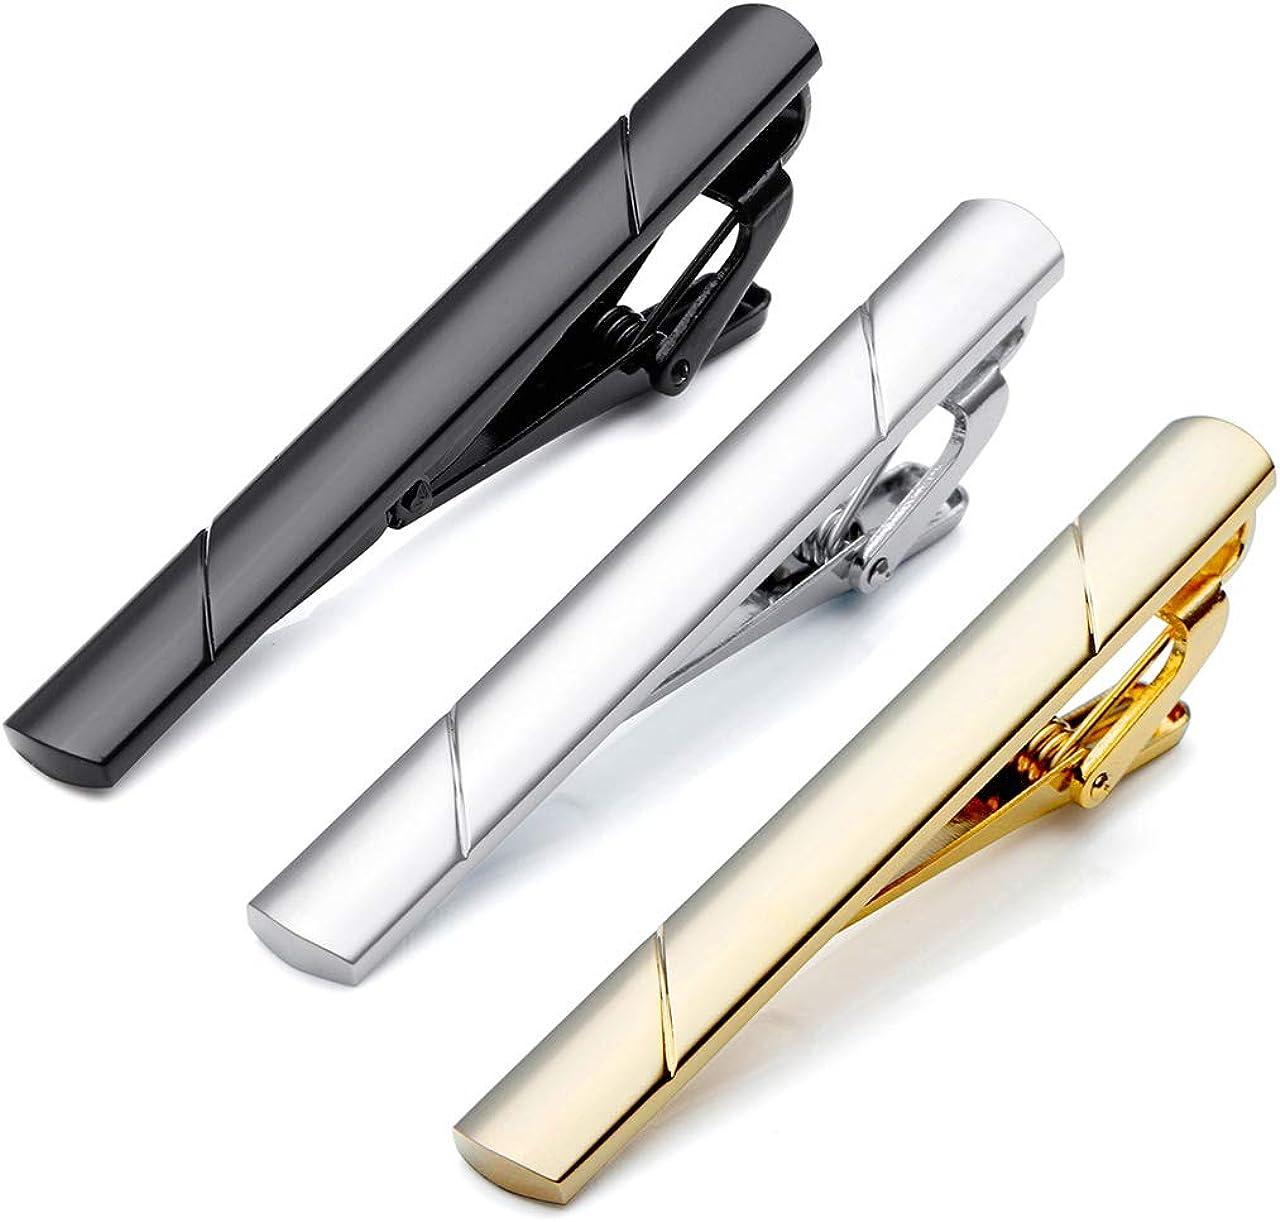 PiercingJ 3pcs Arlington Mall Set Cheap Stainless Steel GQ Exquisite Classic Bar Tie